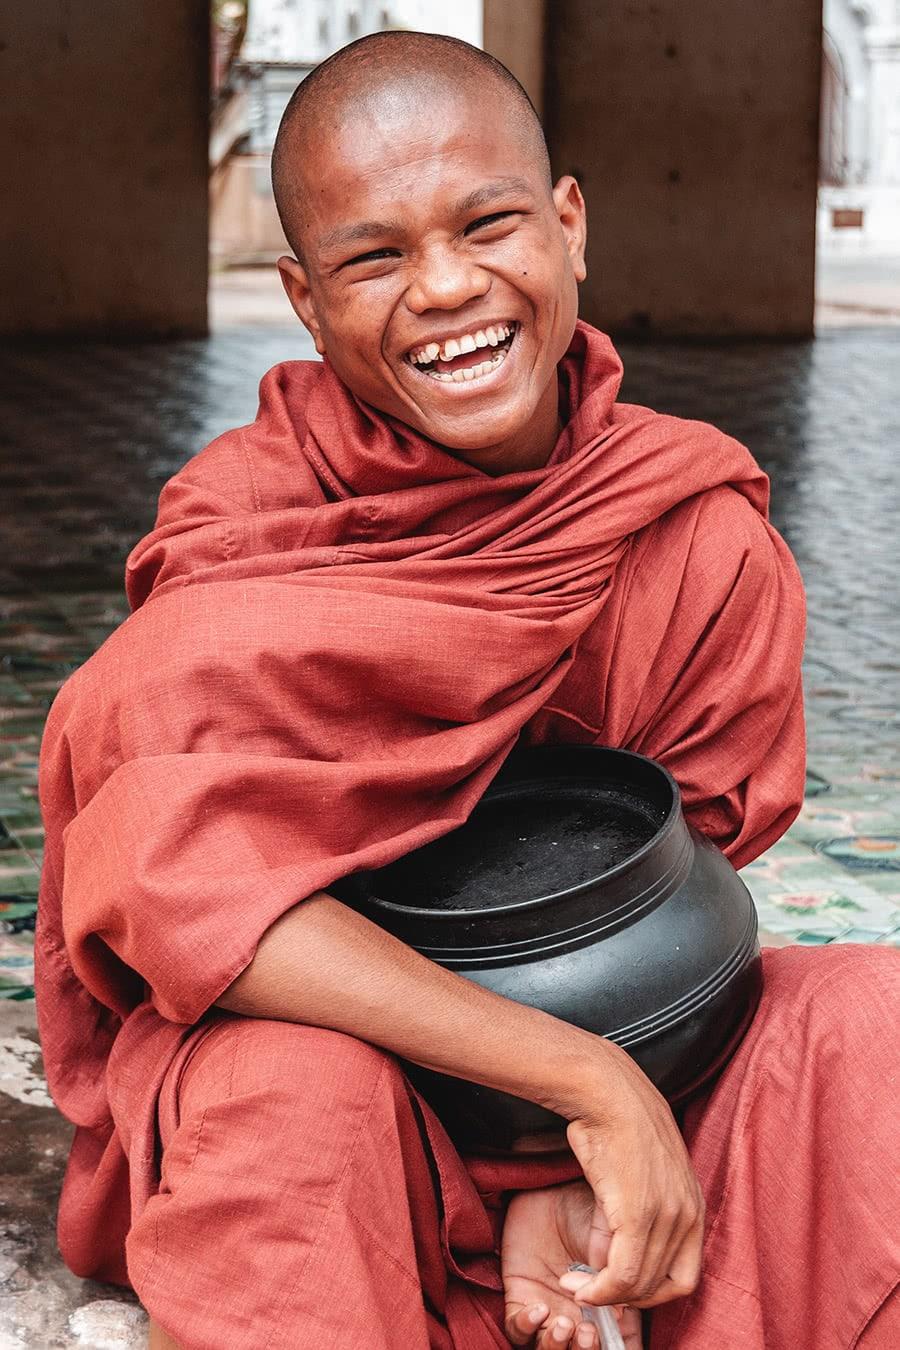 Smiling monk in Bagan, Myanmar.